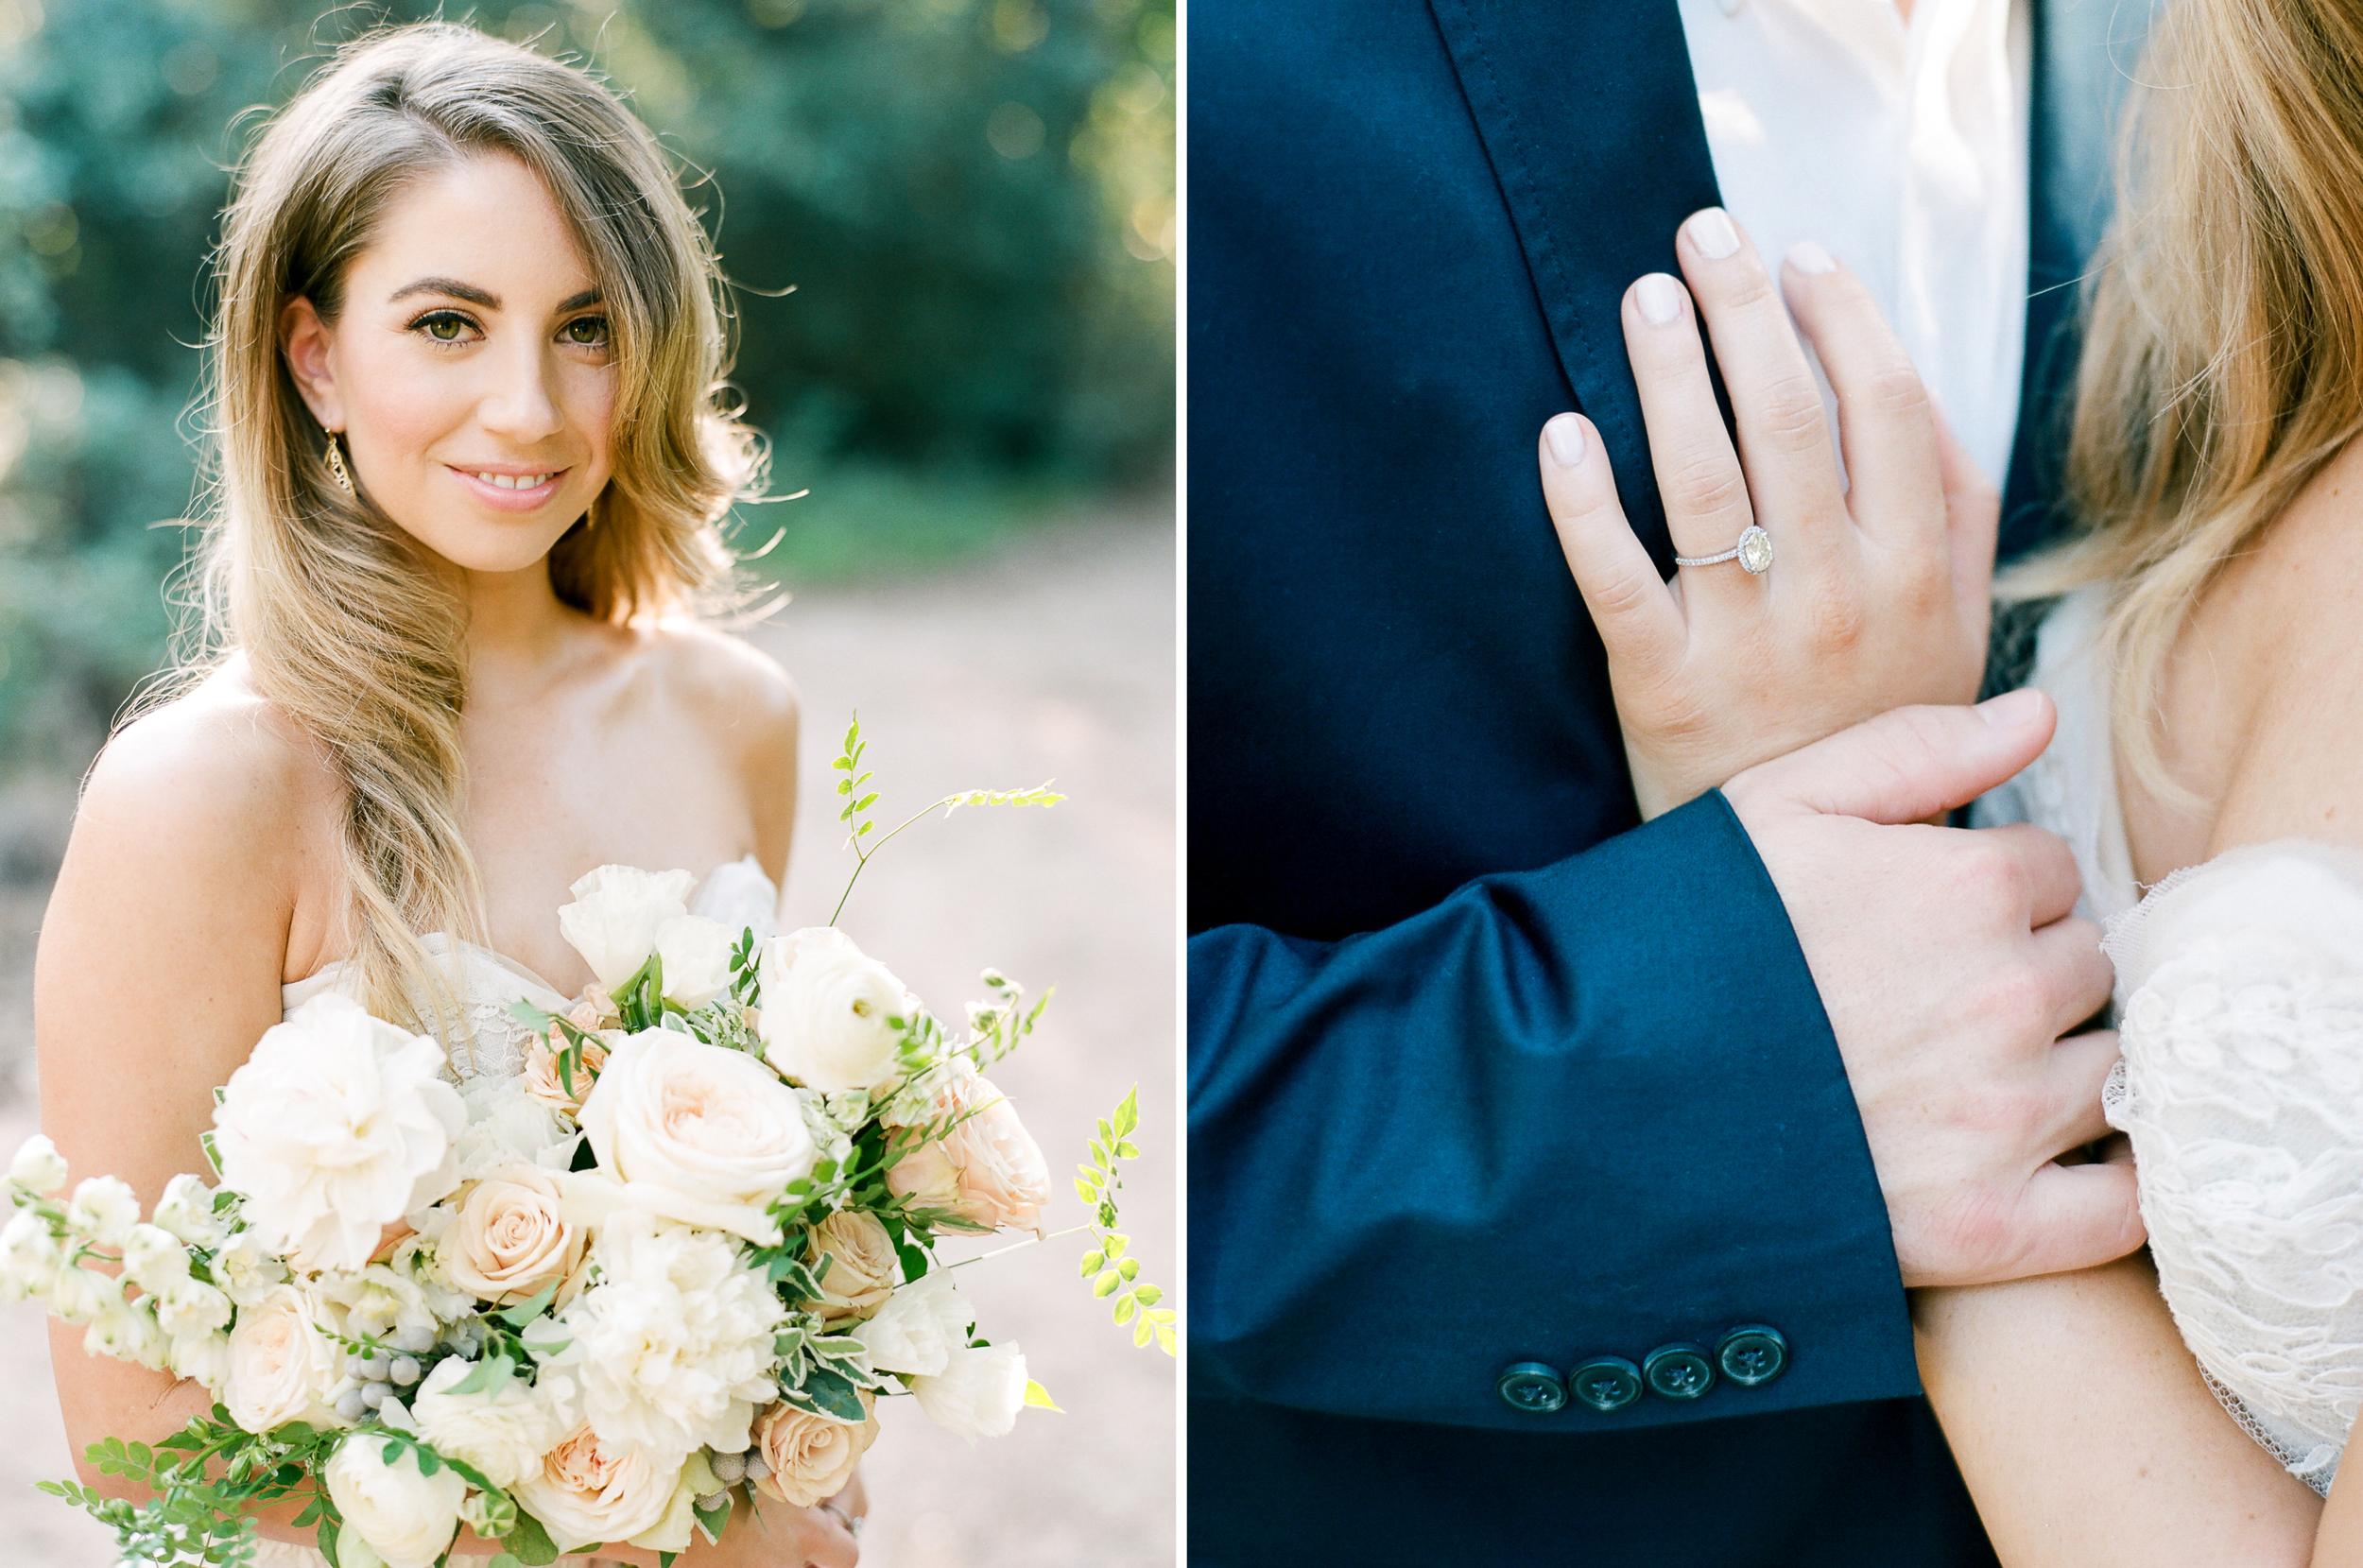 dana-fernandez-photography-the-wedding-chicks-film-houston-wedding-photography-destination-131.jpg